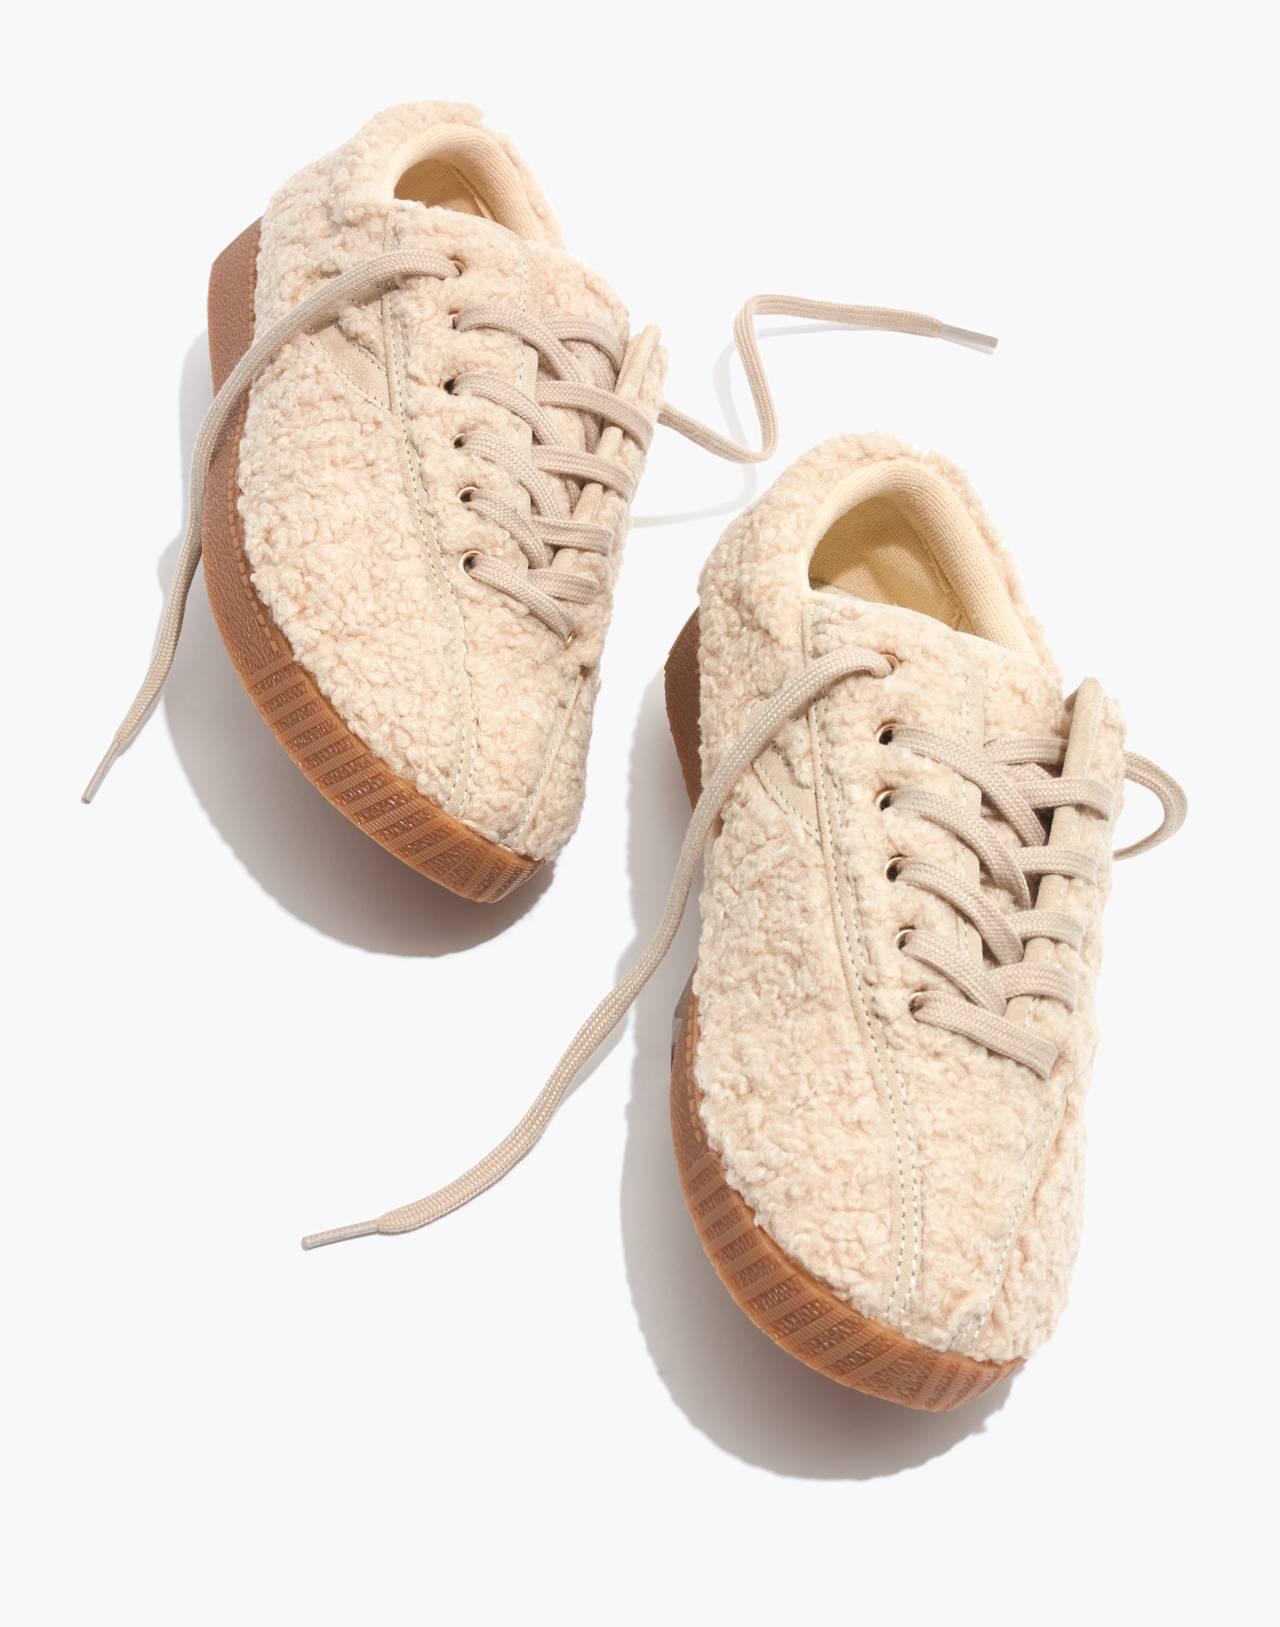 Tretorn® Nylite Plus Sneakers in Cream Faux Shearling in cream image 1